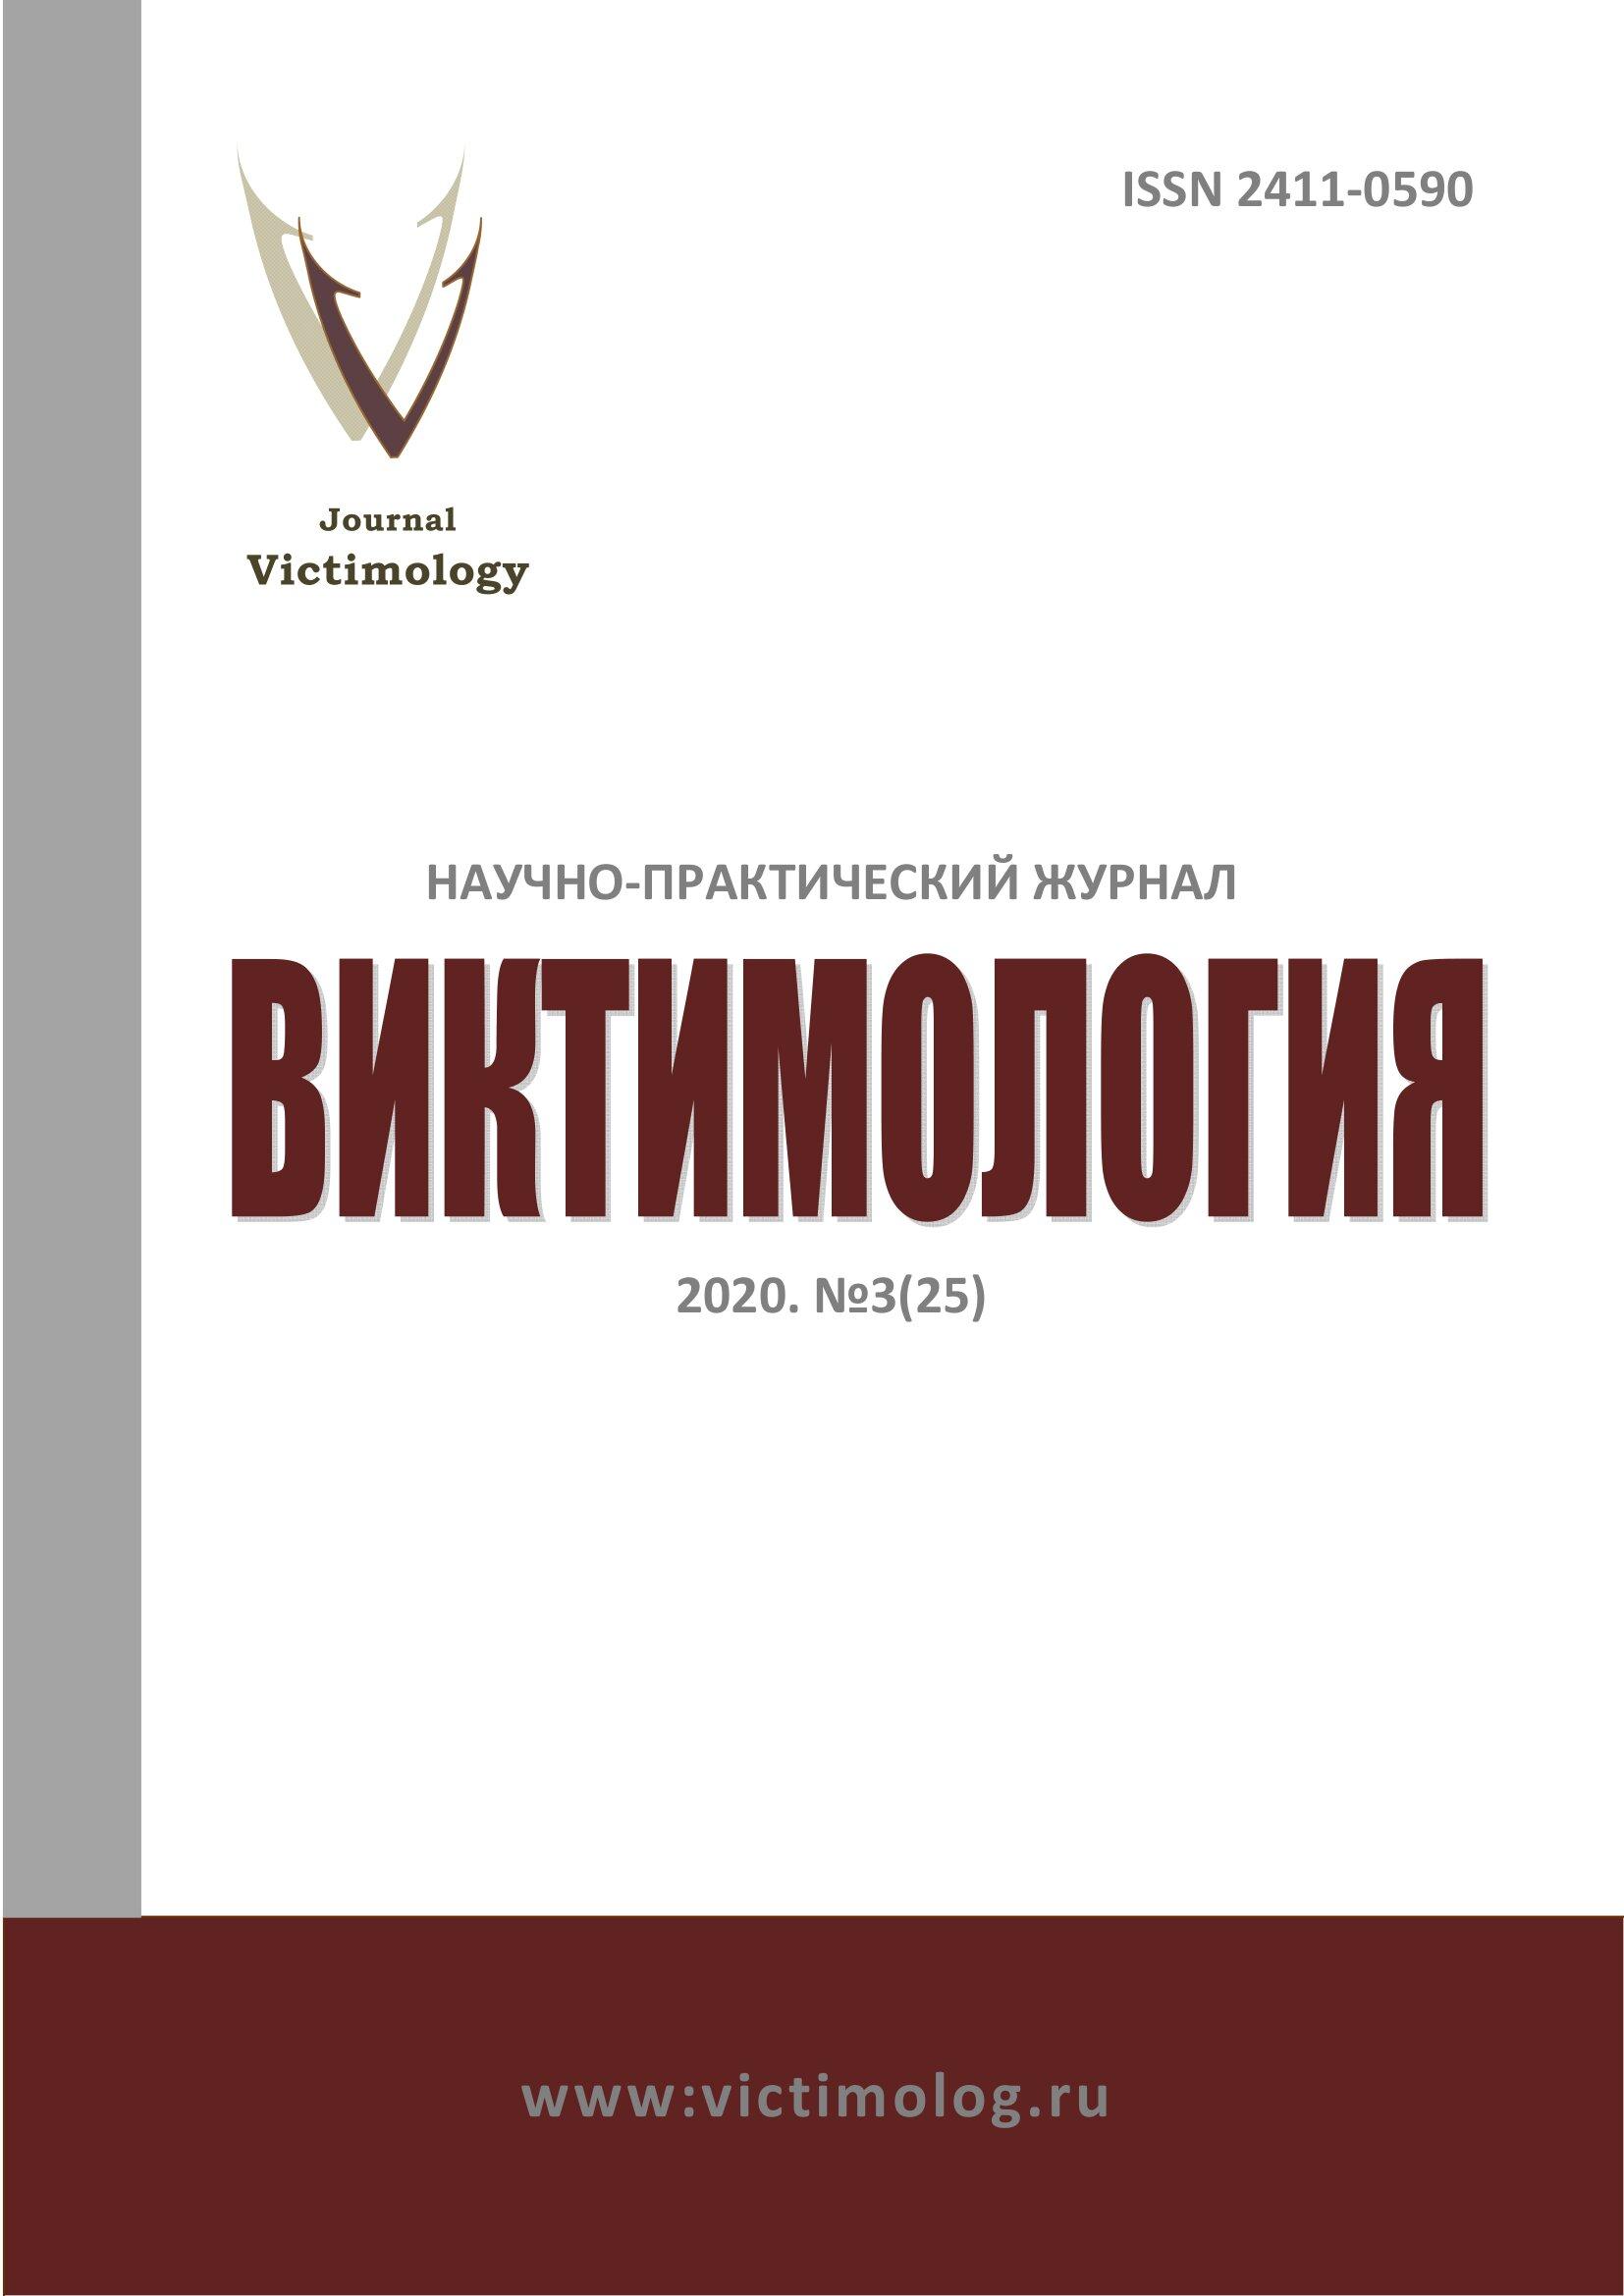 Журнал Виктимология